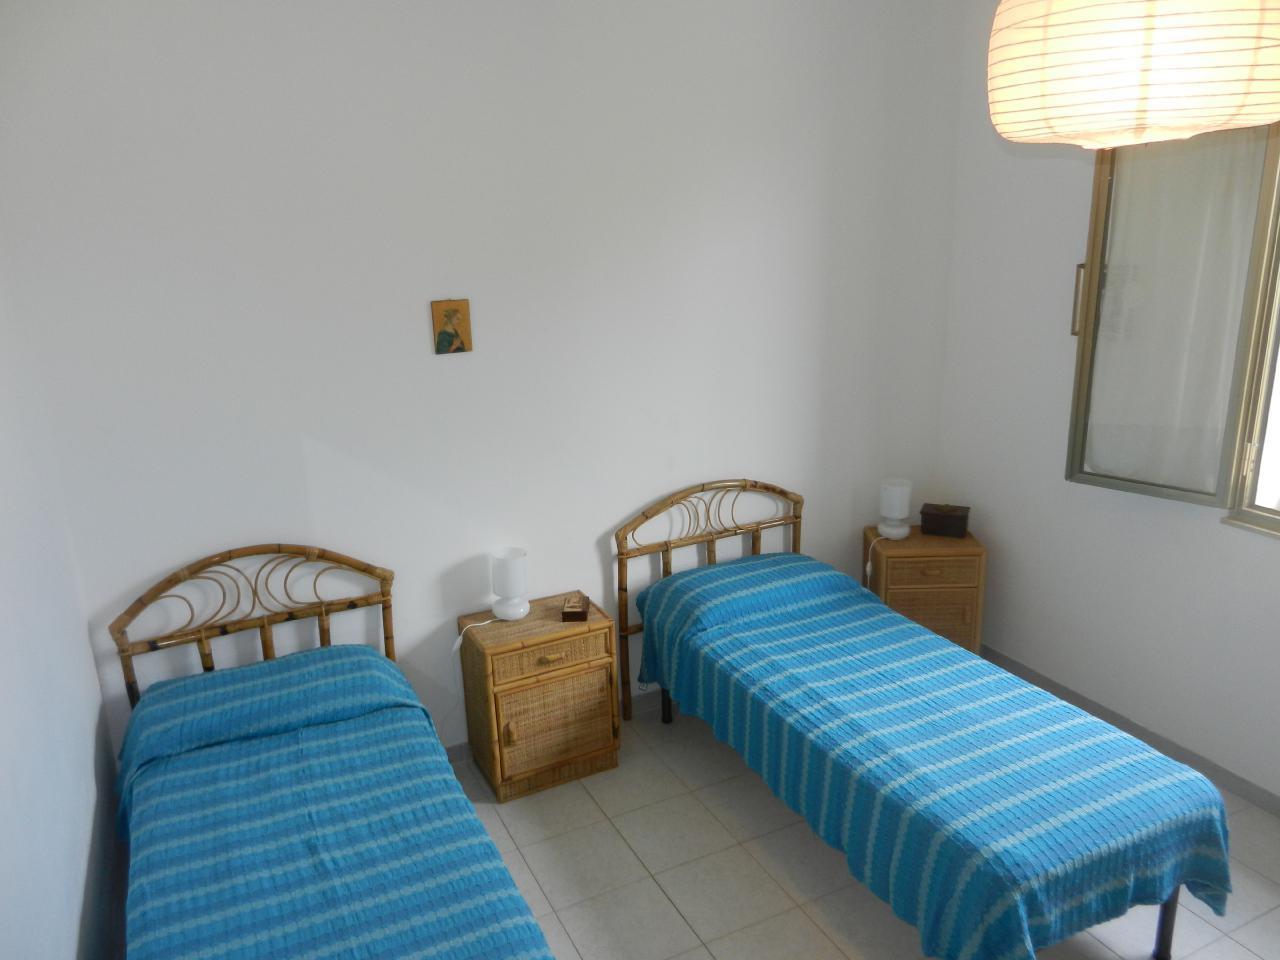 Maison de vacances Villa Mediterranea (57184), Menfi, Agrigento, Sicile, Italie, image 20